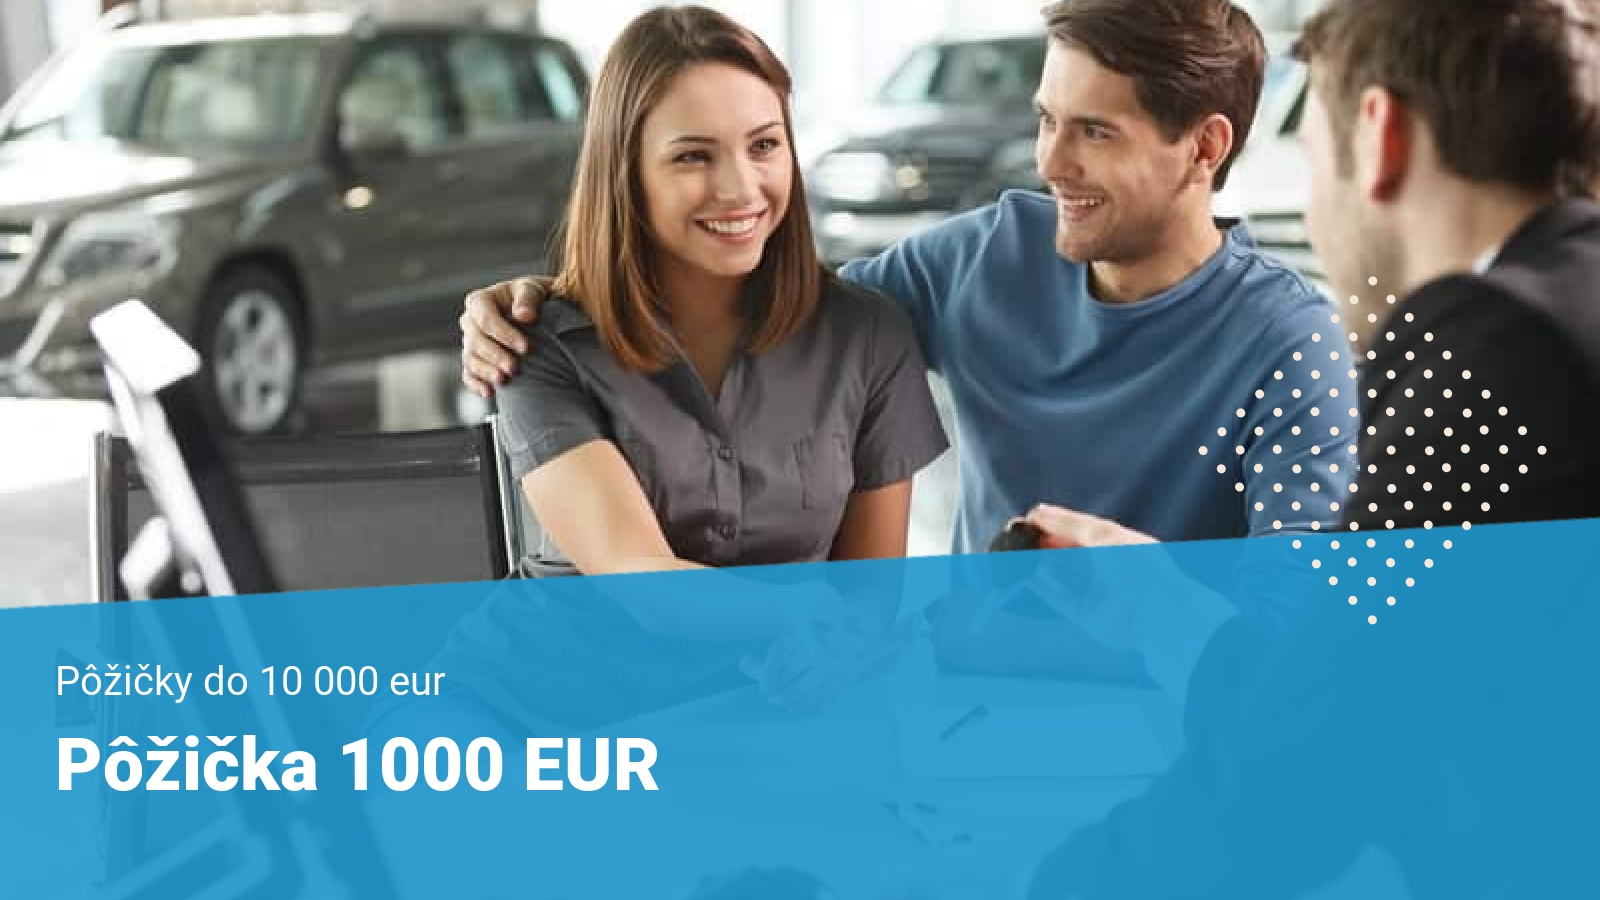 Pozicka-1000-eur